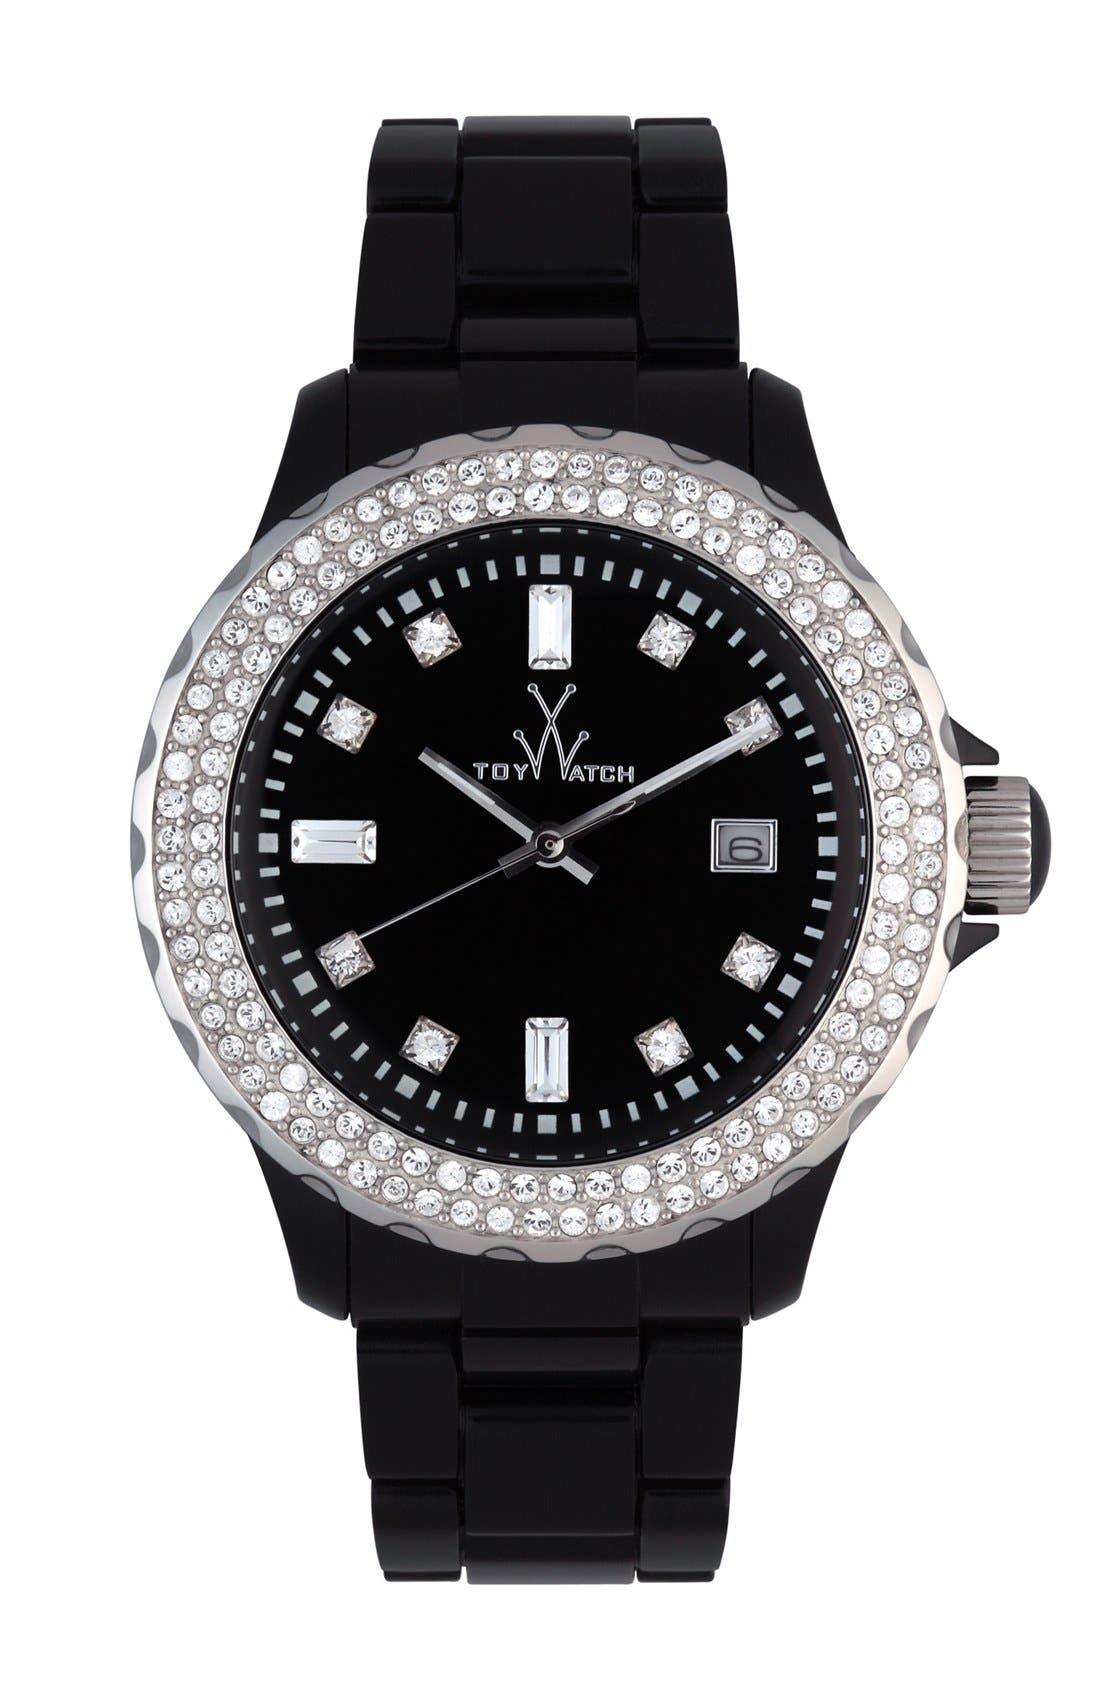 Main Image - TOYWATCH 'Plasteramic' Bracelet Watch, 41mm